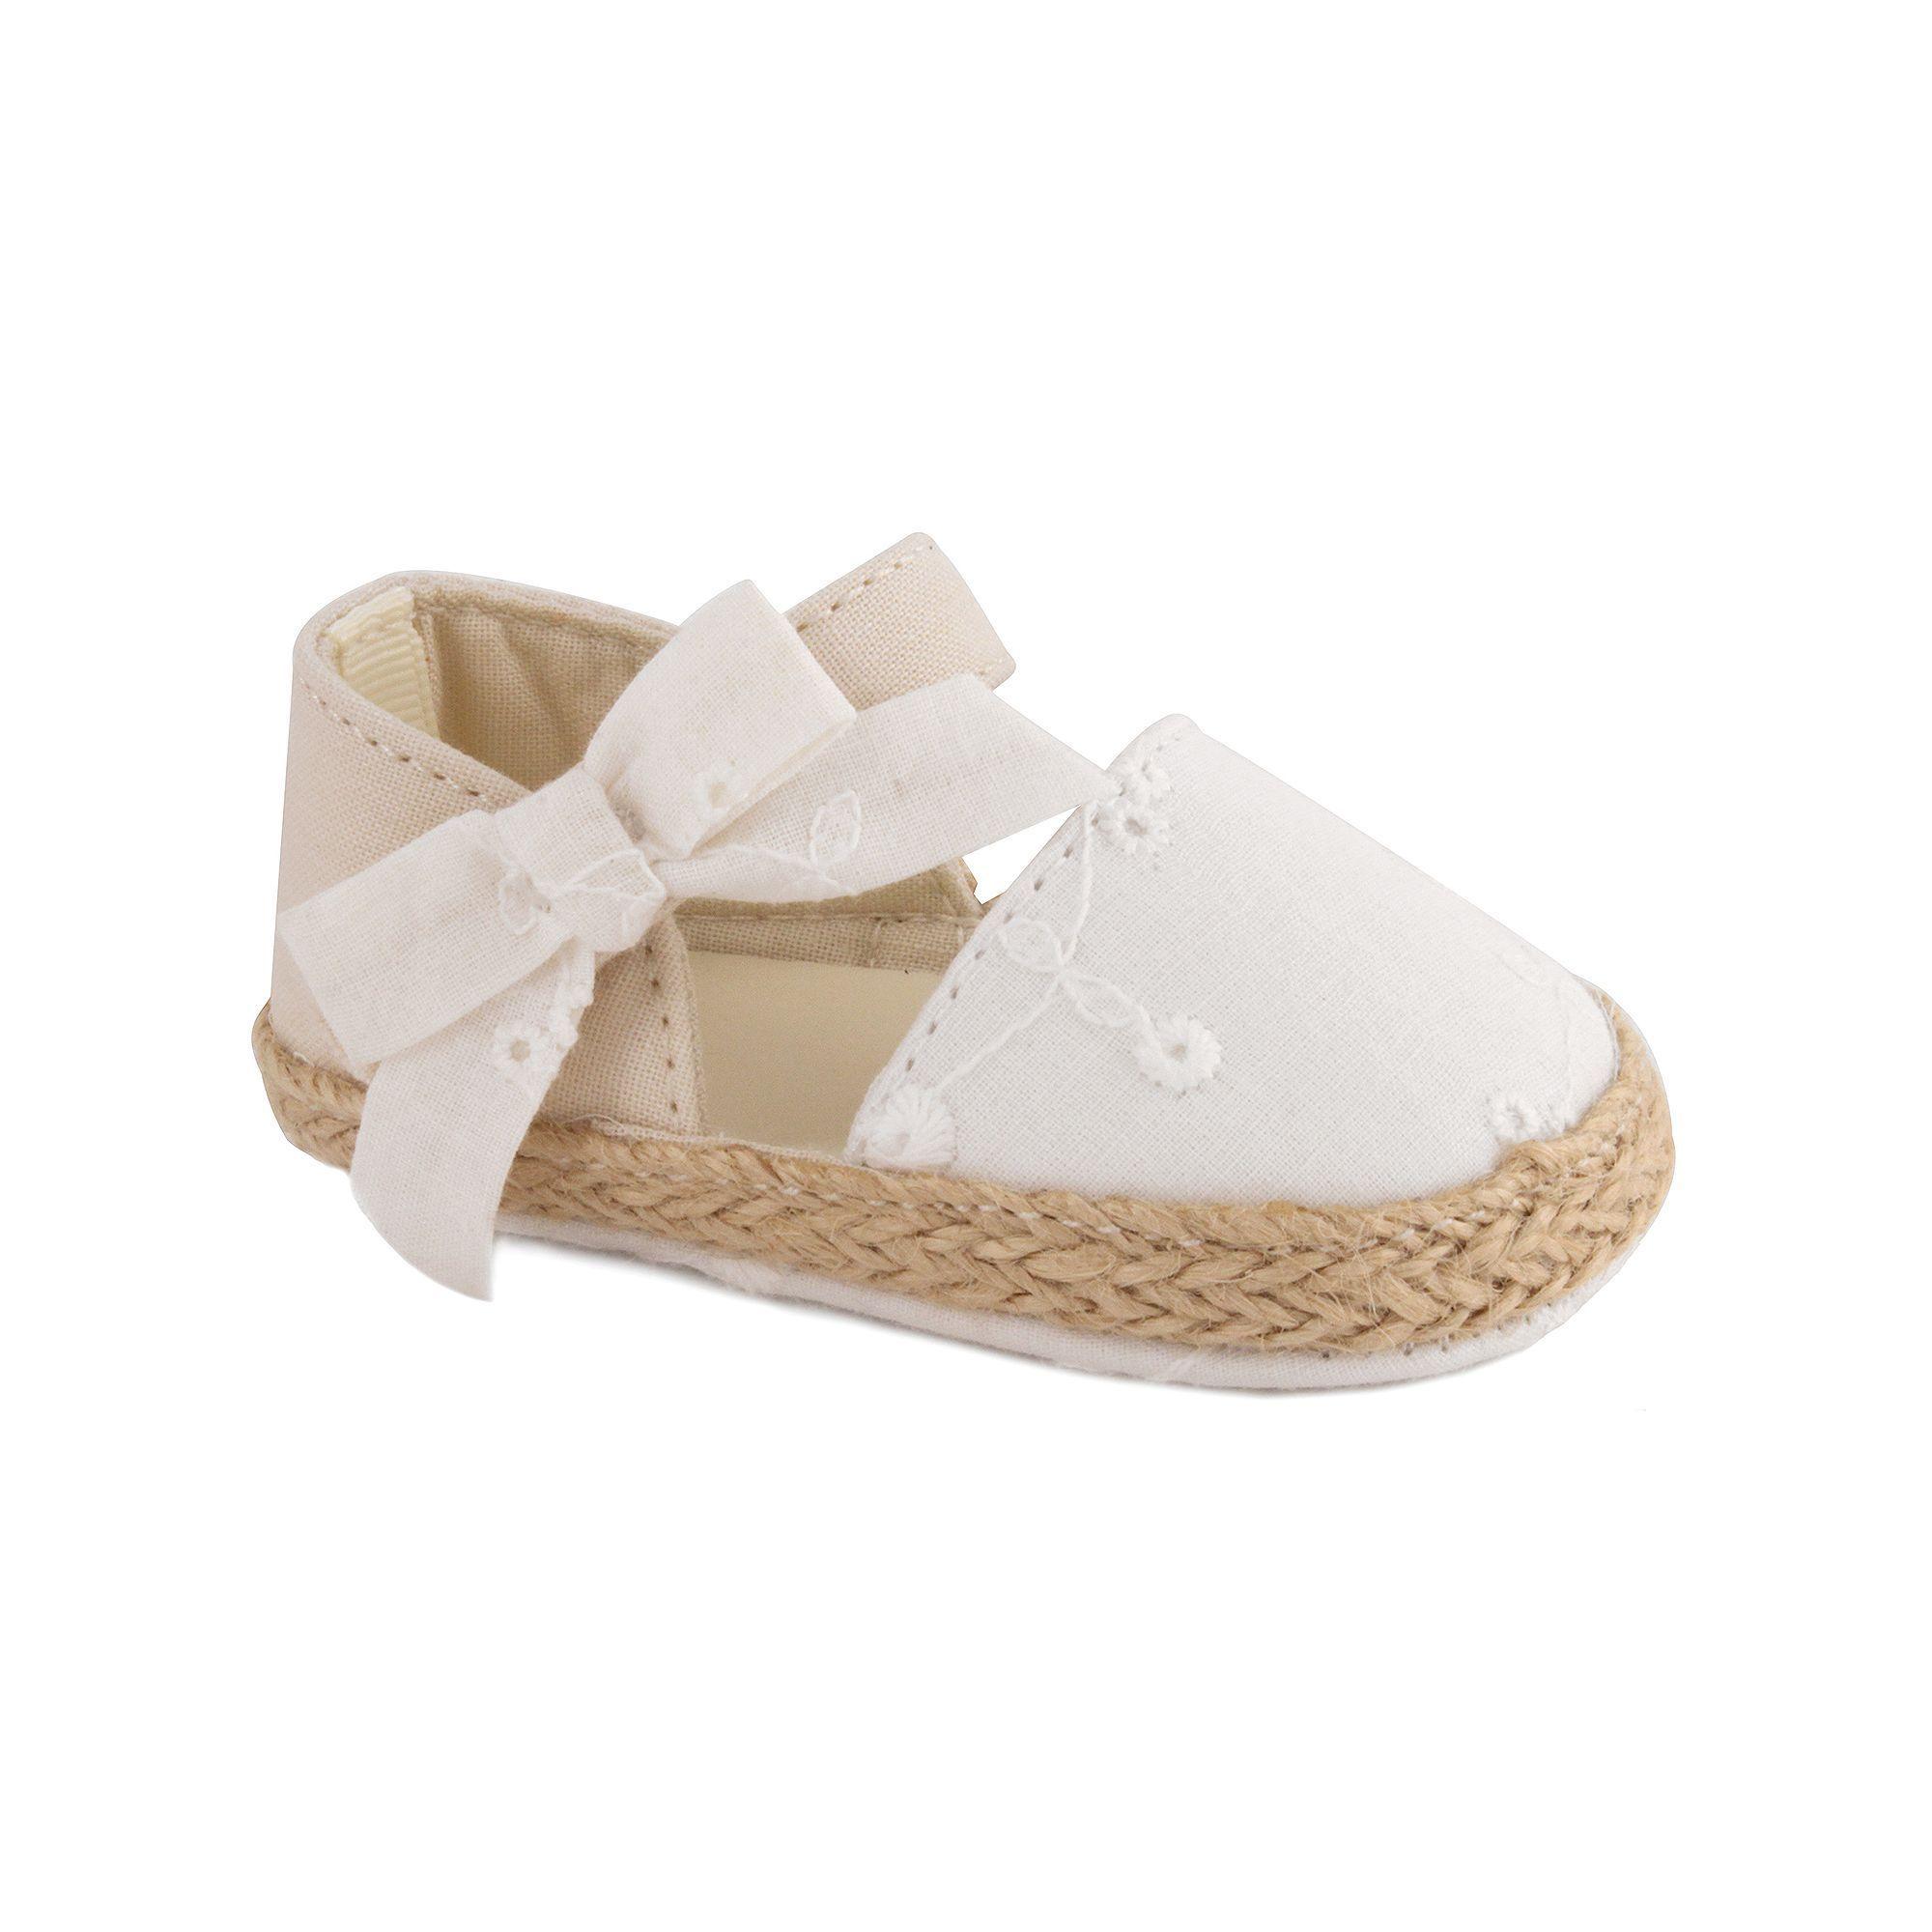 Baby Girl Wee Kids Eyelet Espadrille Crib Shoes Size 3 White